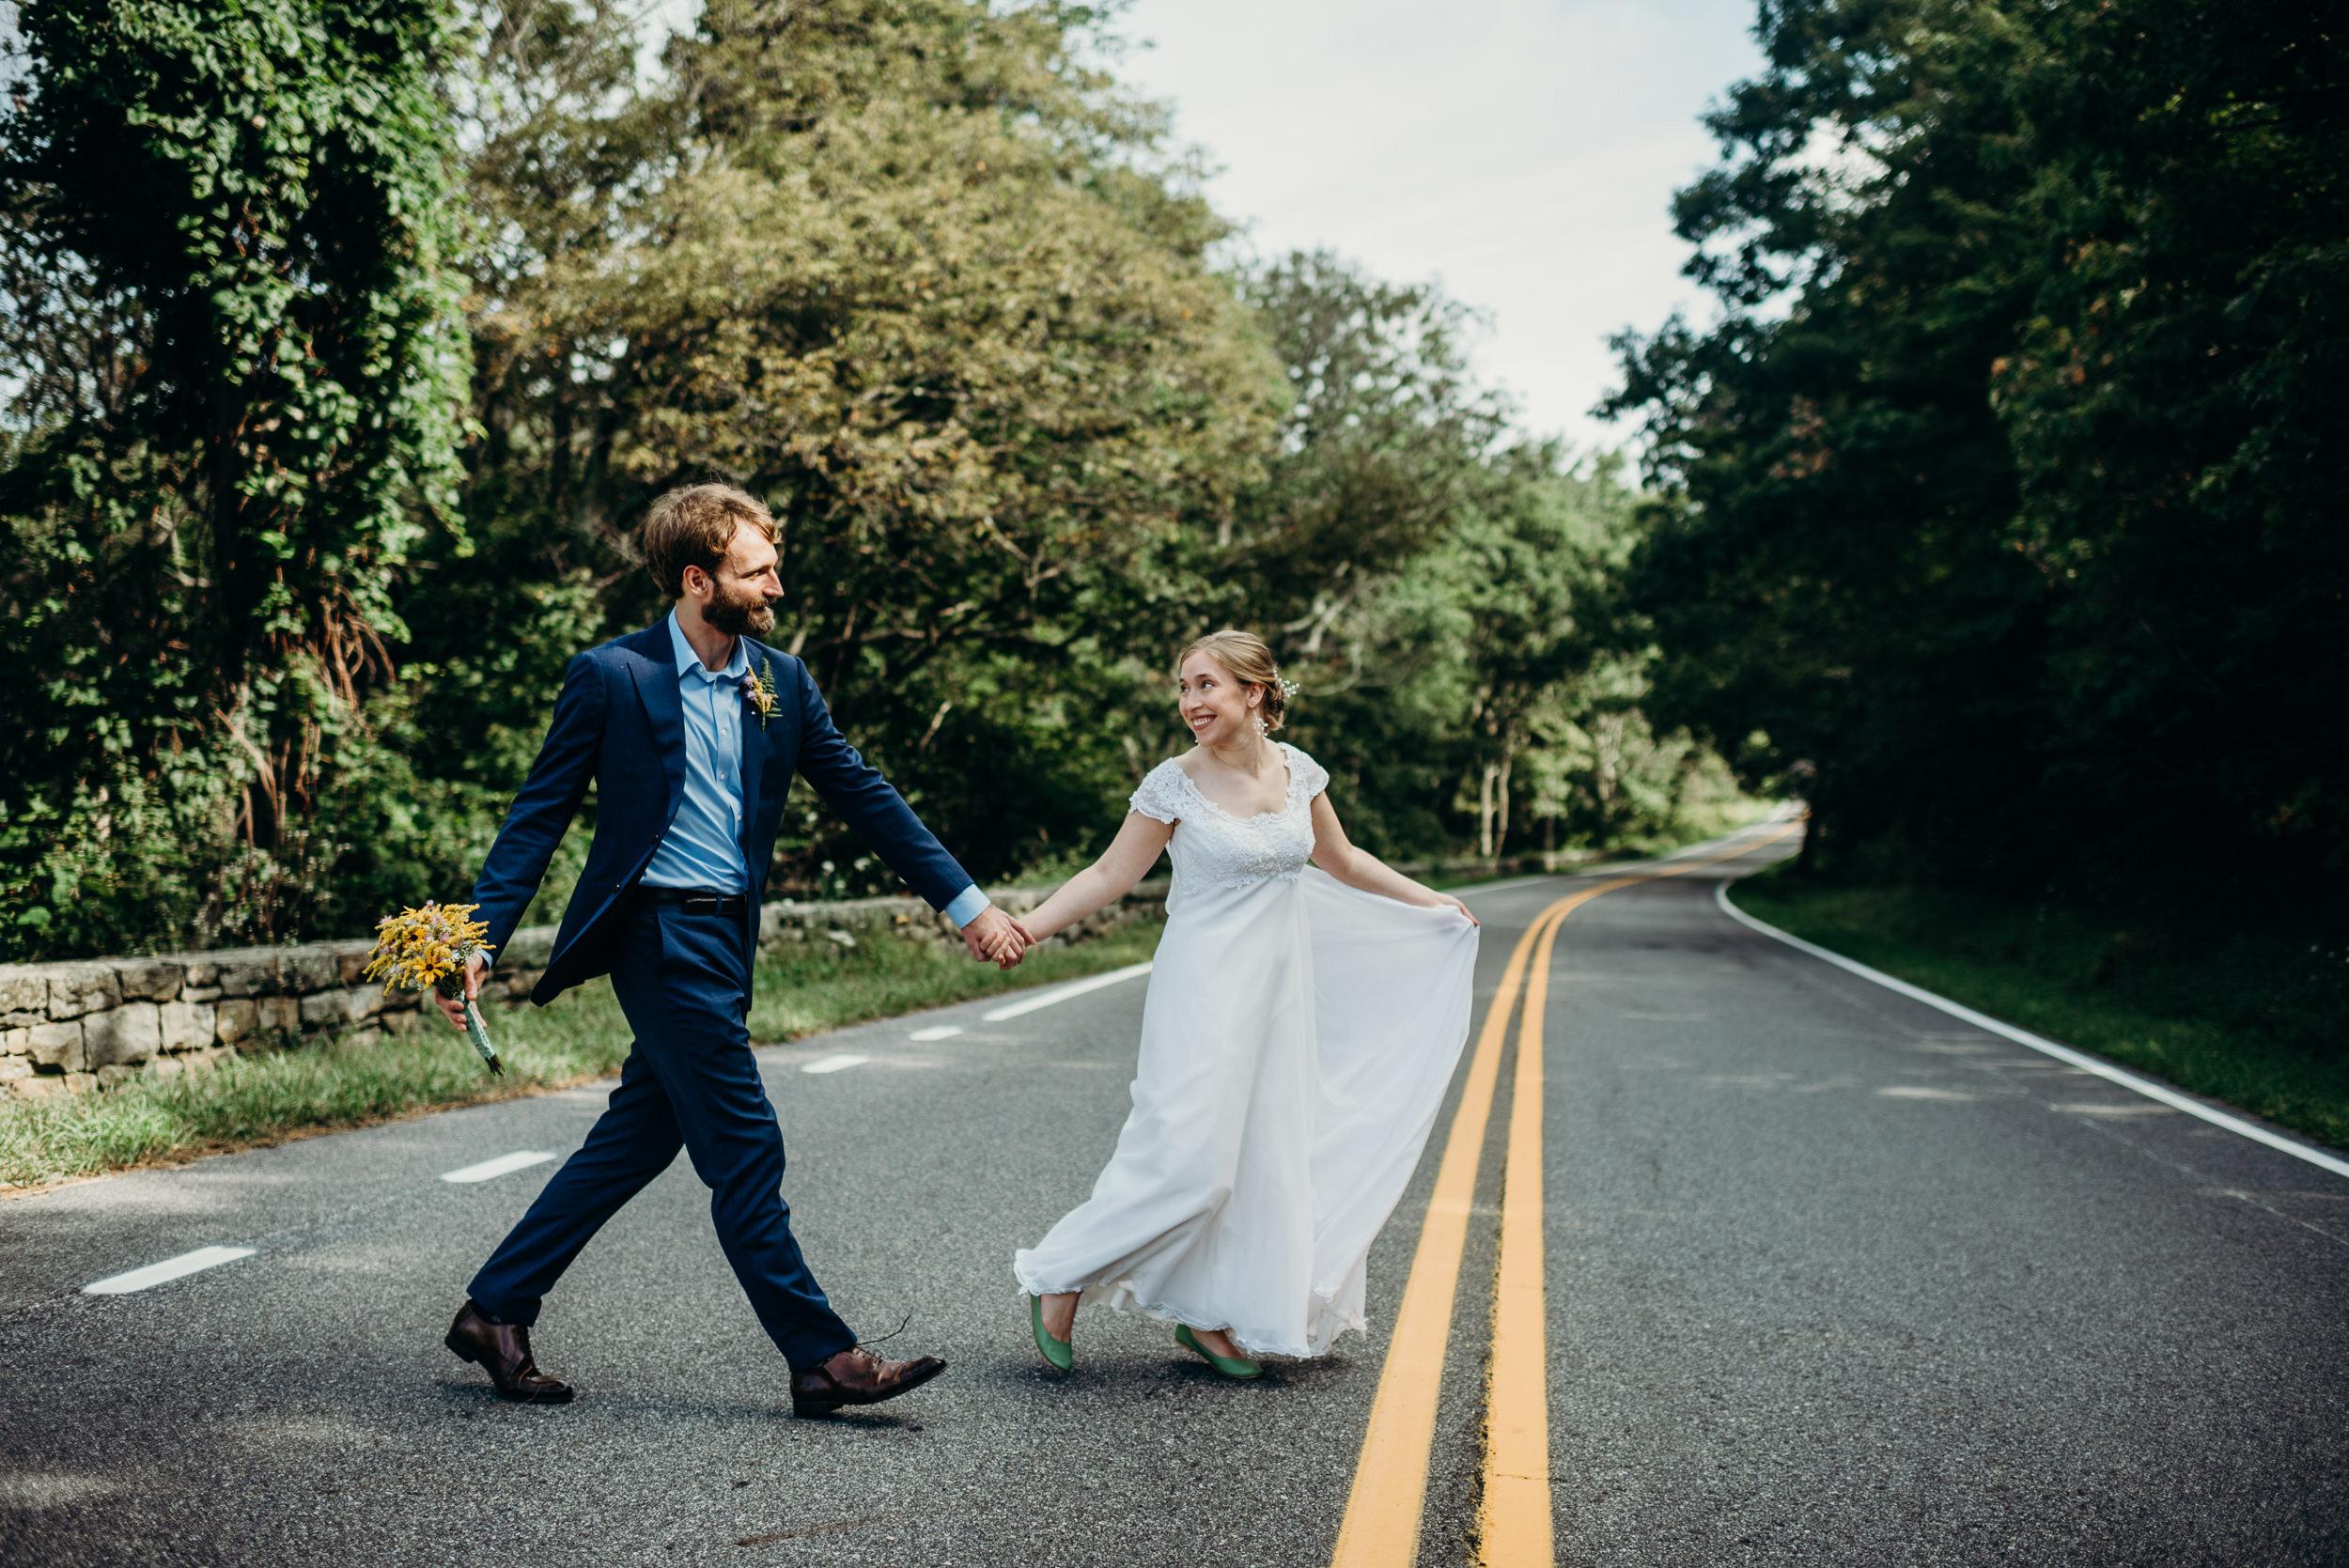 intimate-wedding-photographer-skyland-resort-wedding-shenandoah7.jpg